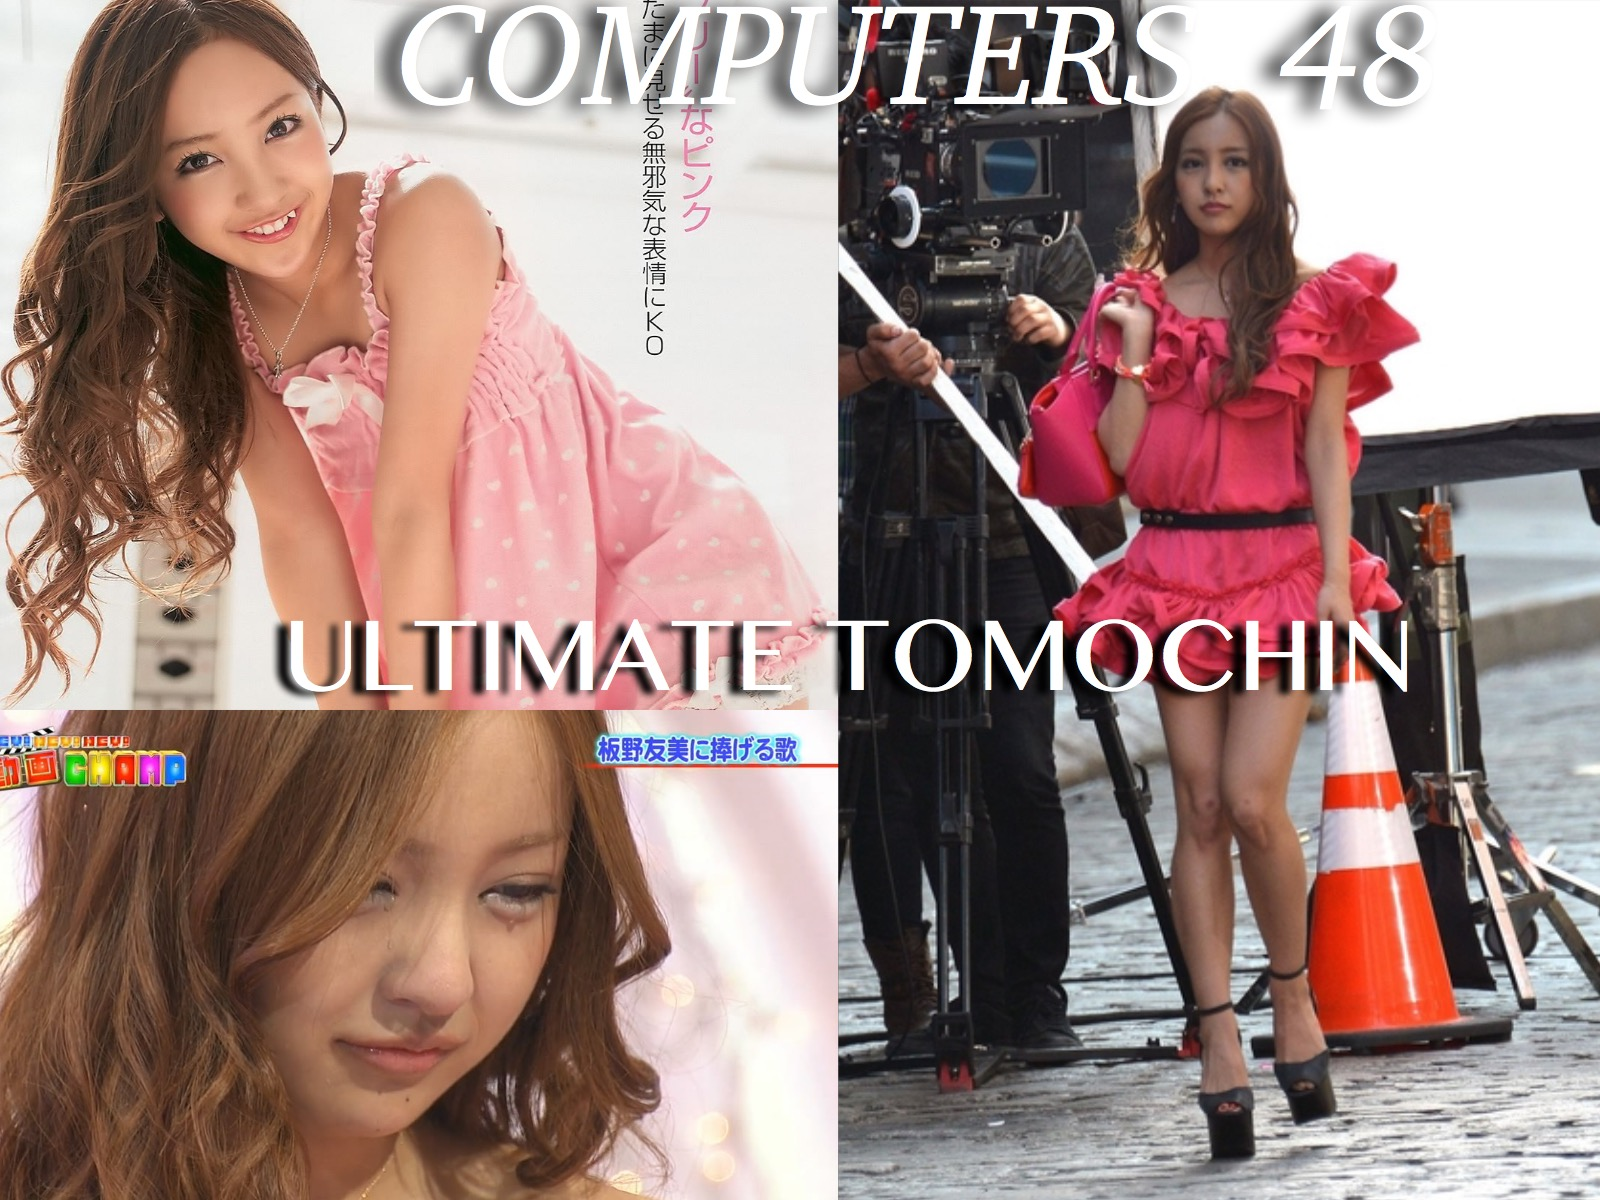 Itano Tomomi 板野 友美 Ultimate Tomochin : AKB48 SKE48 NMB48 HKT48 SNH48 NGT48 TPE48